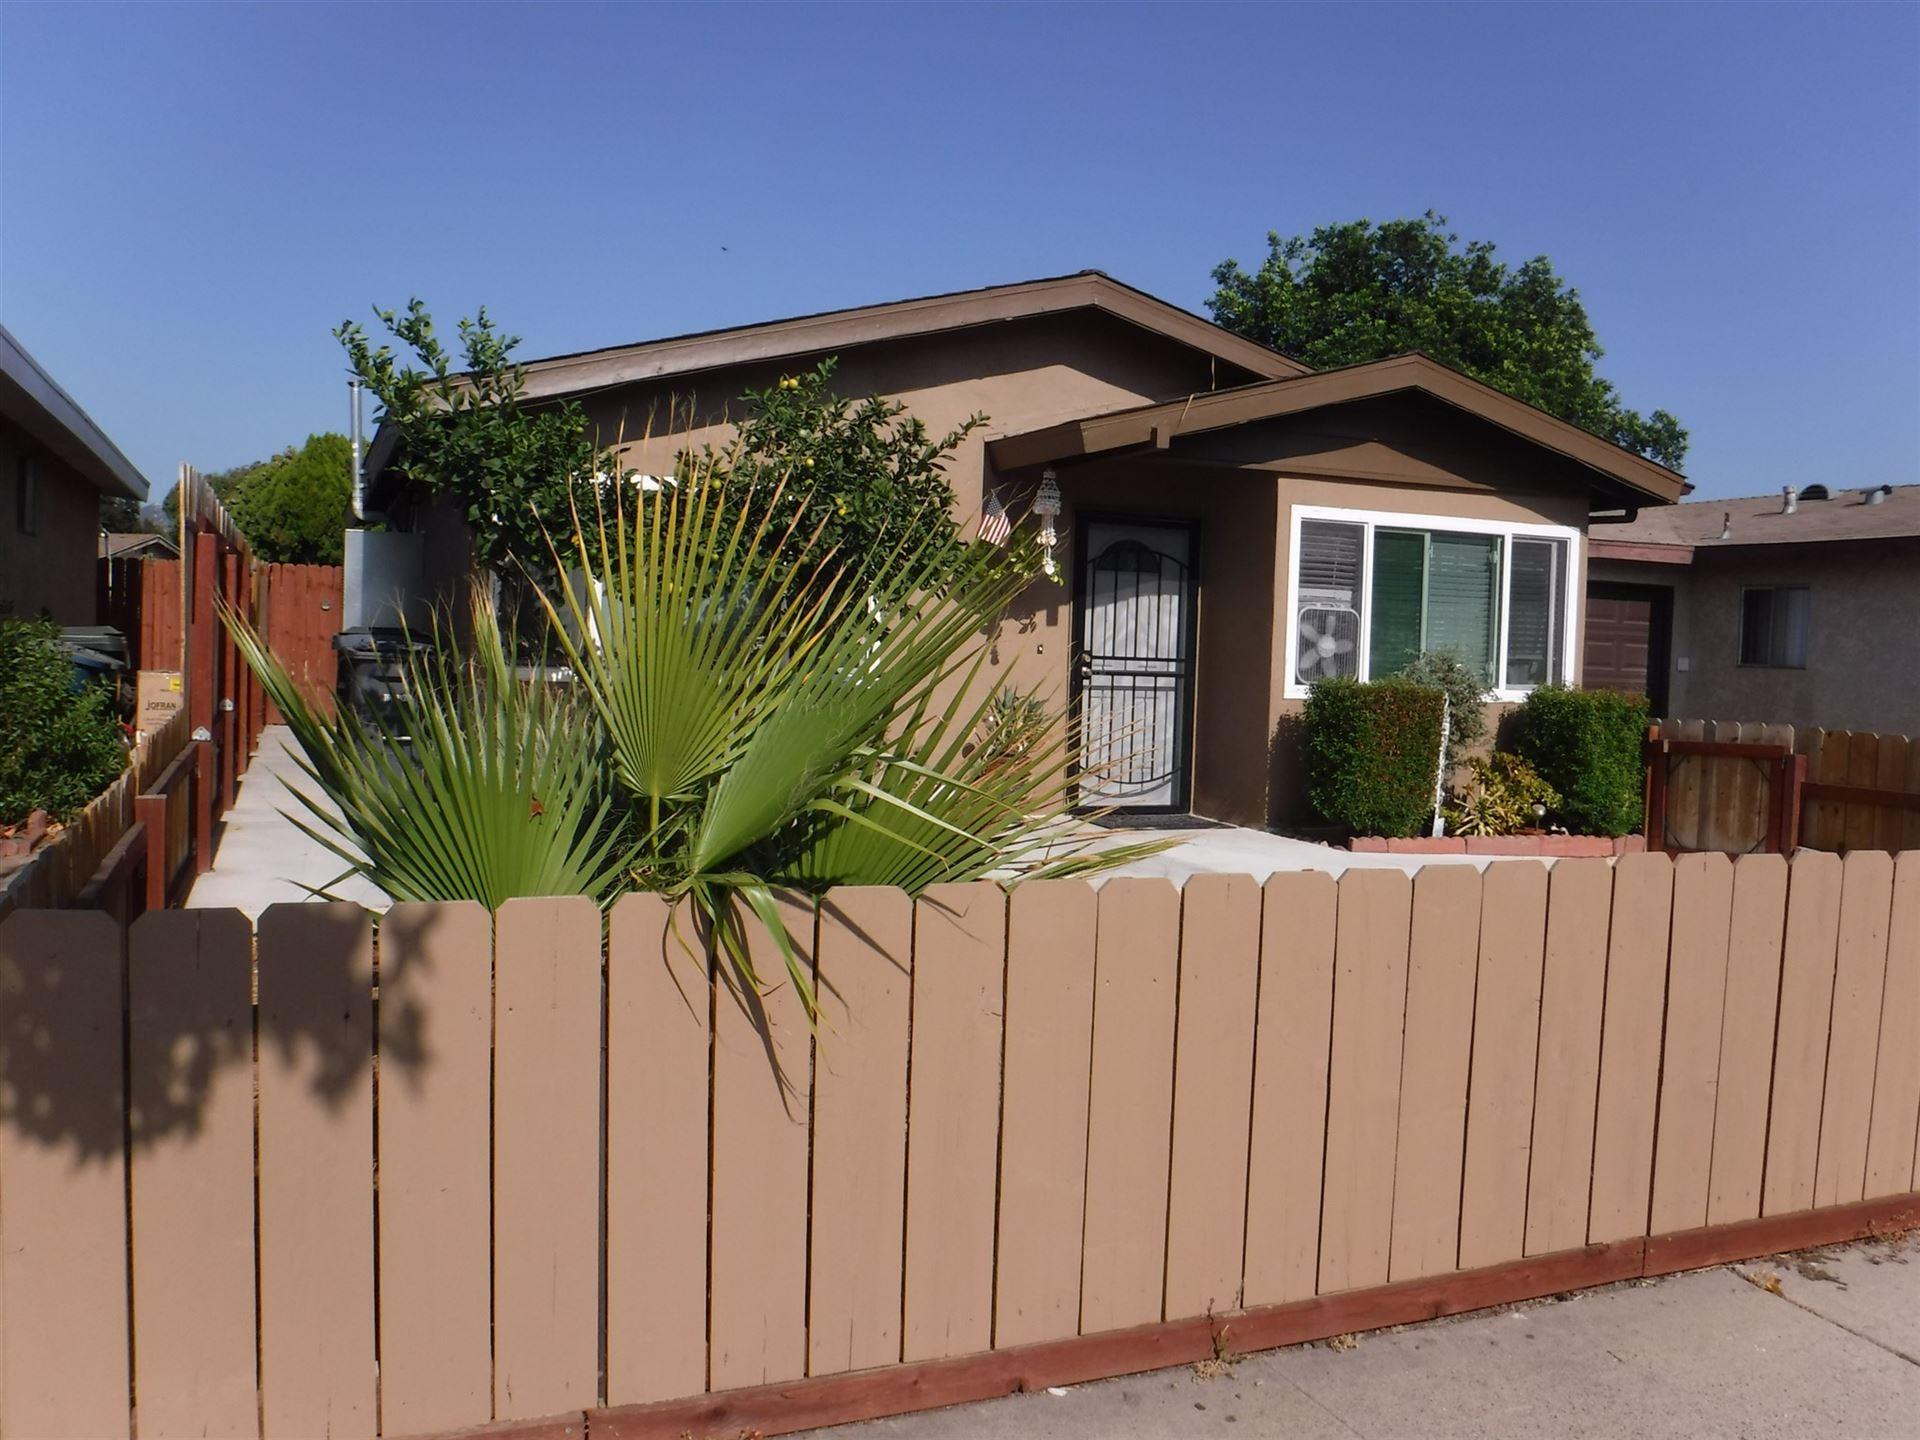 Photo of 104 N Rose St., Escondido, CA 92027 (MLS # 200045964)